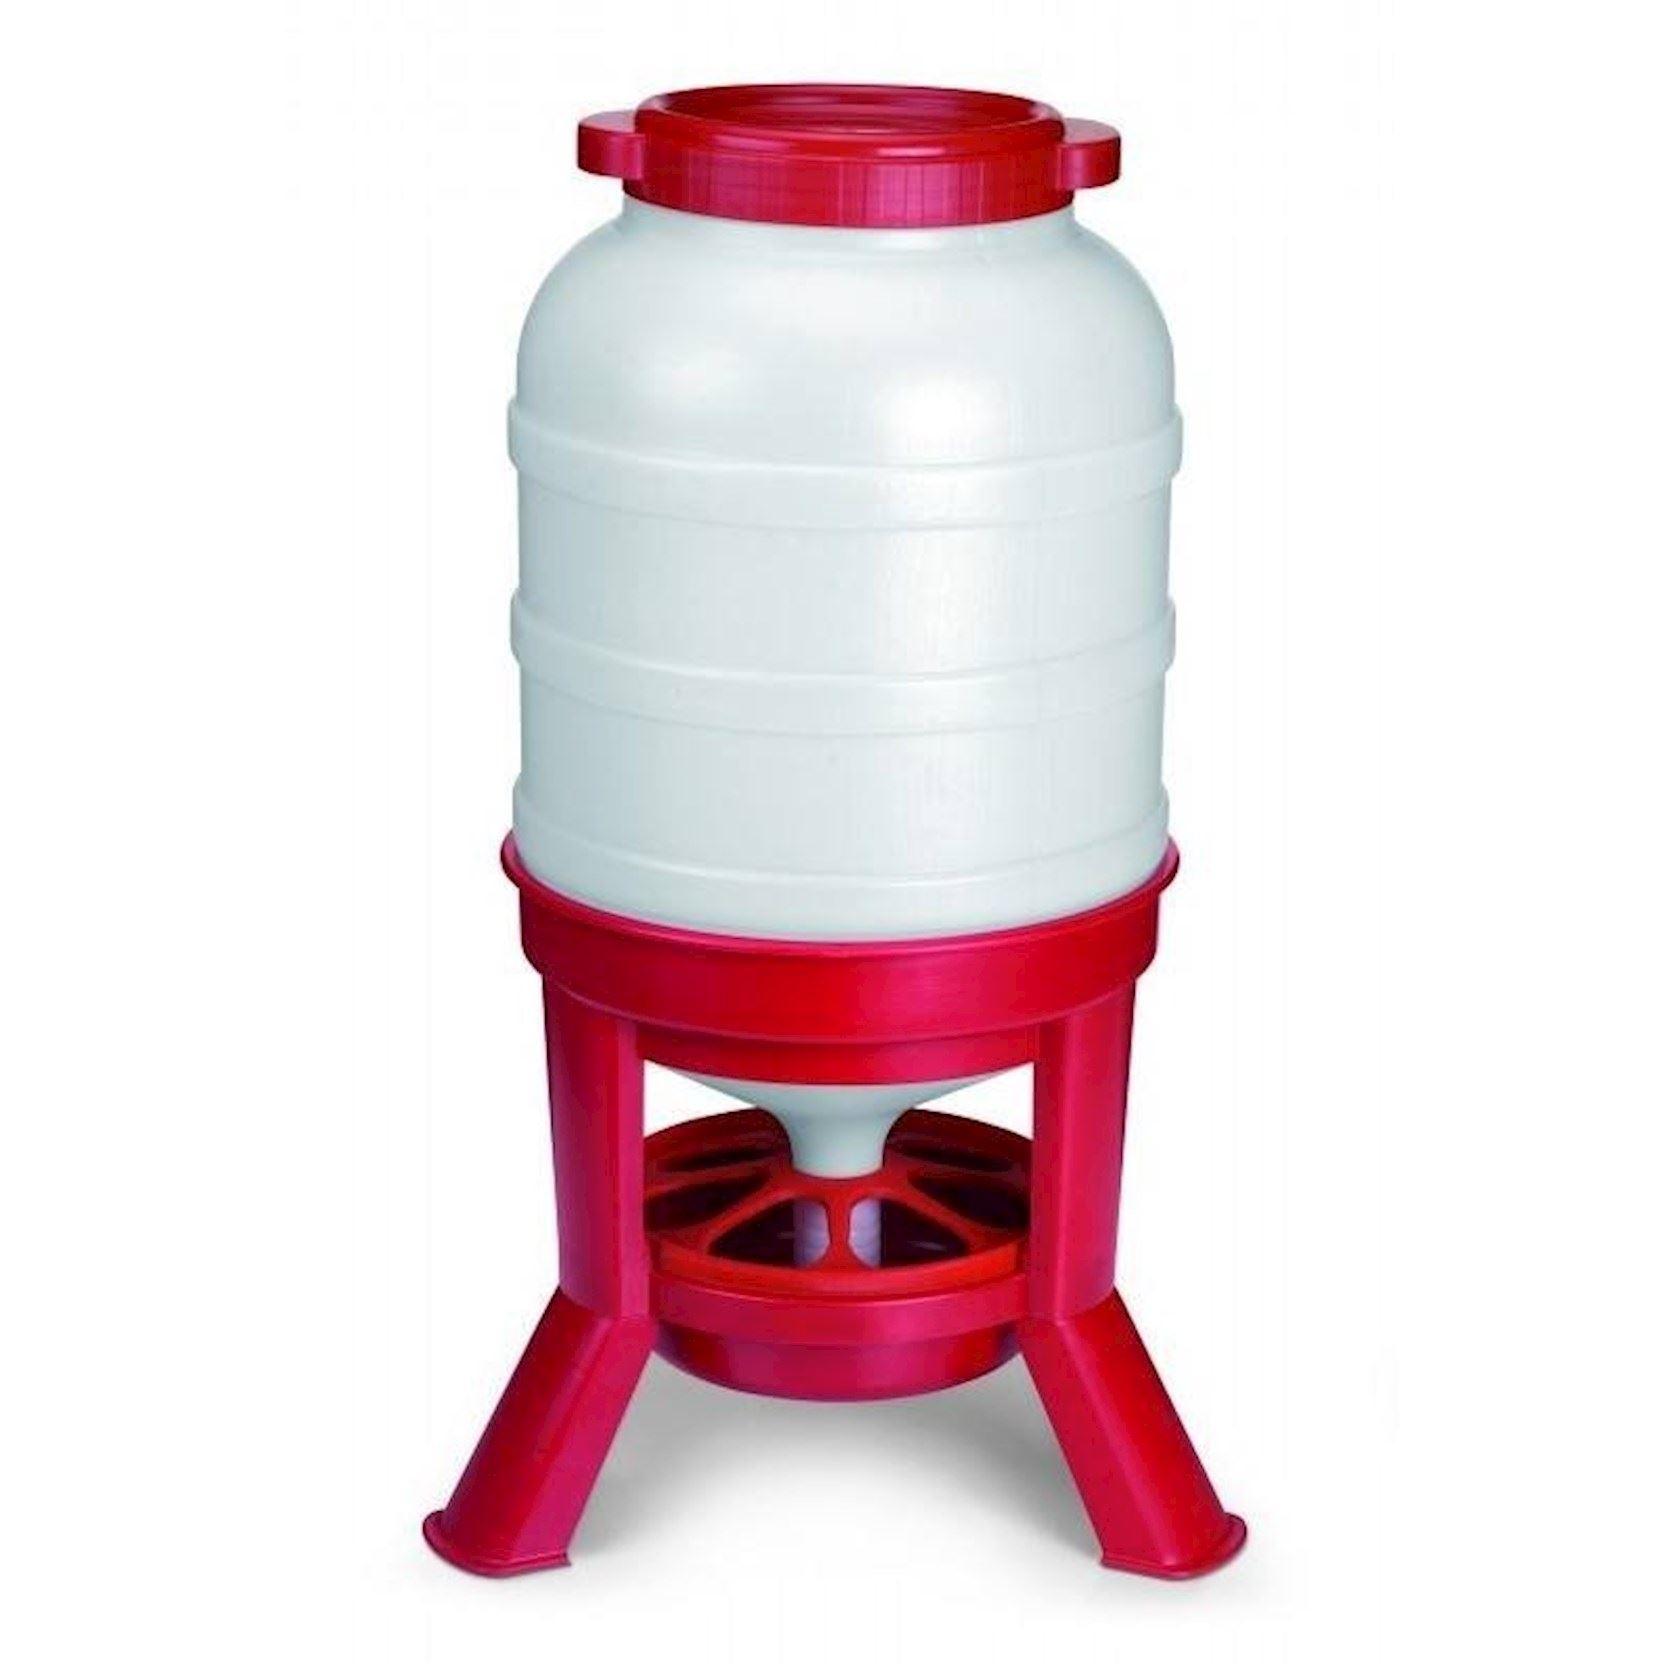 Voedersilo-rood-40-liter